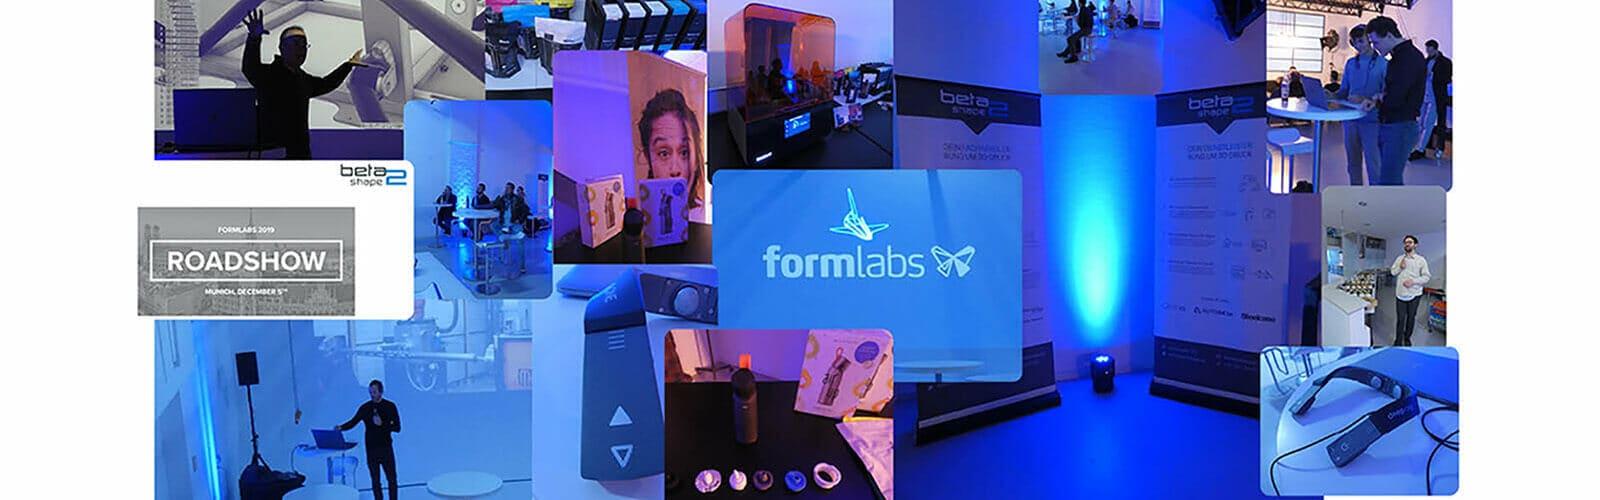 Formlabs Roadshow München 2019 bei Beta2Shape collage